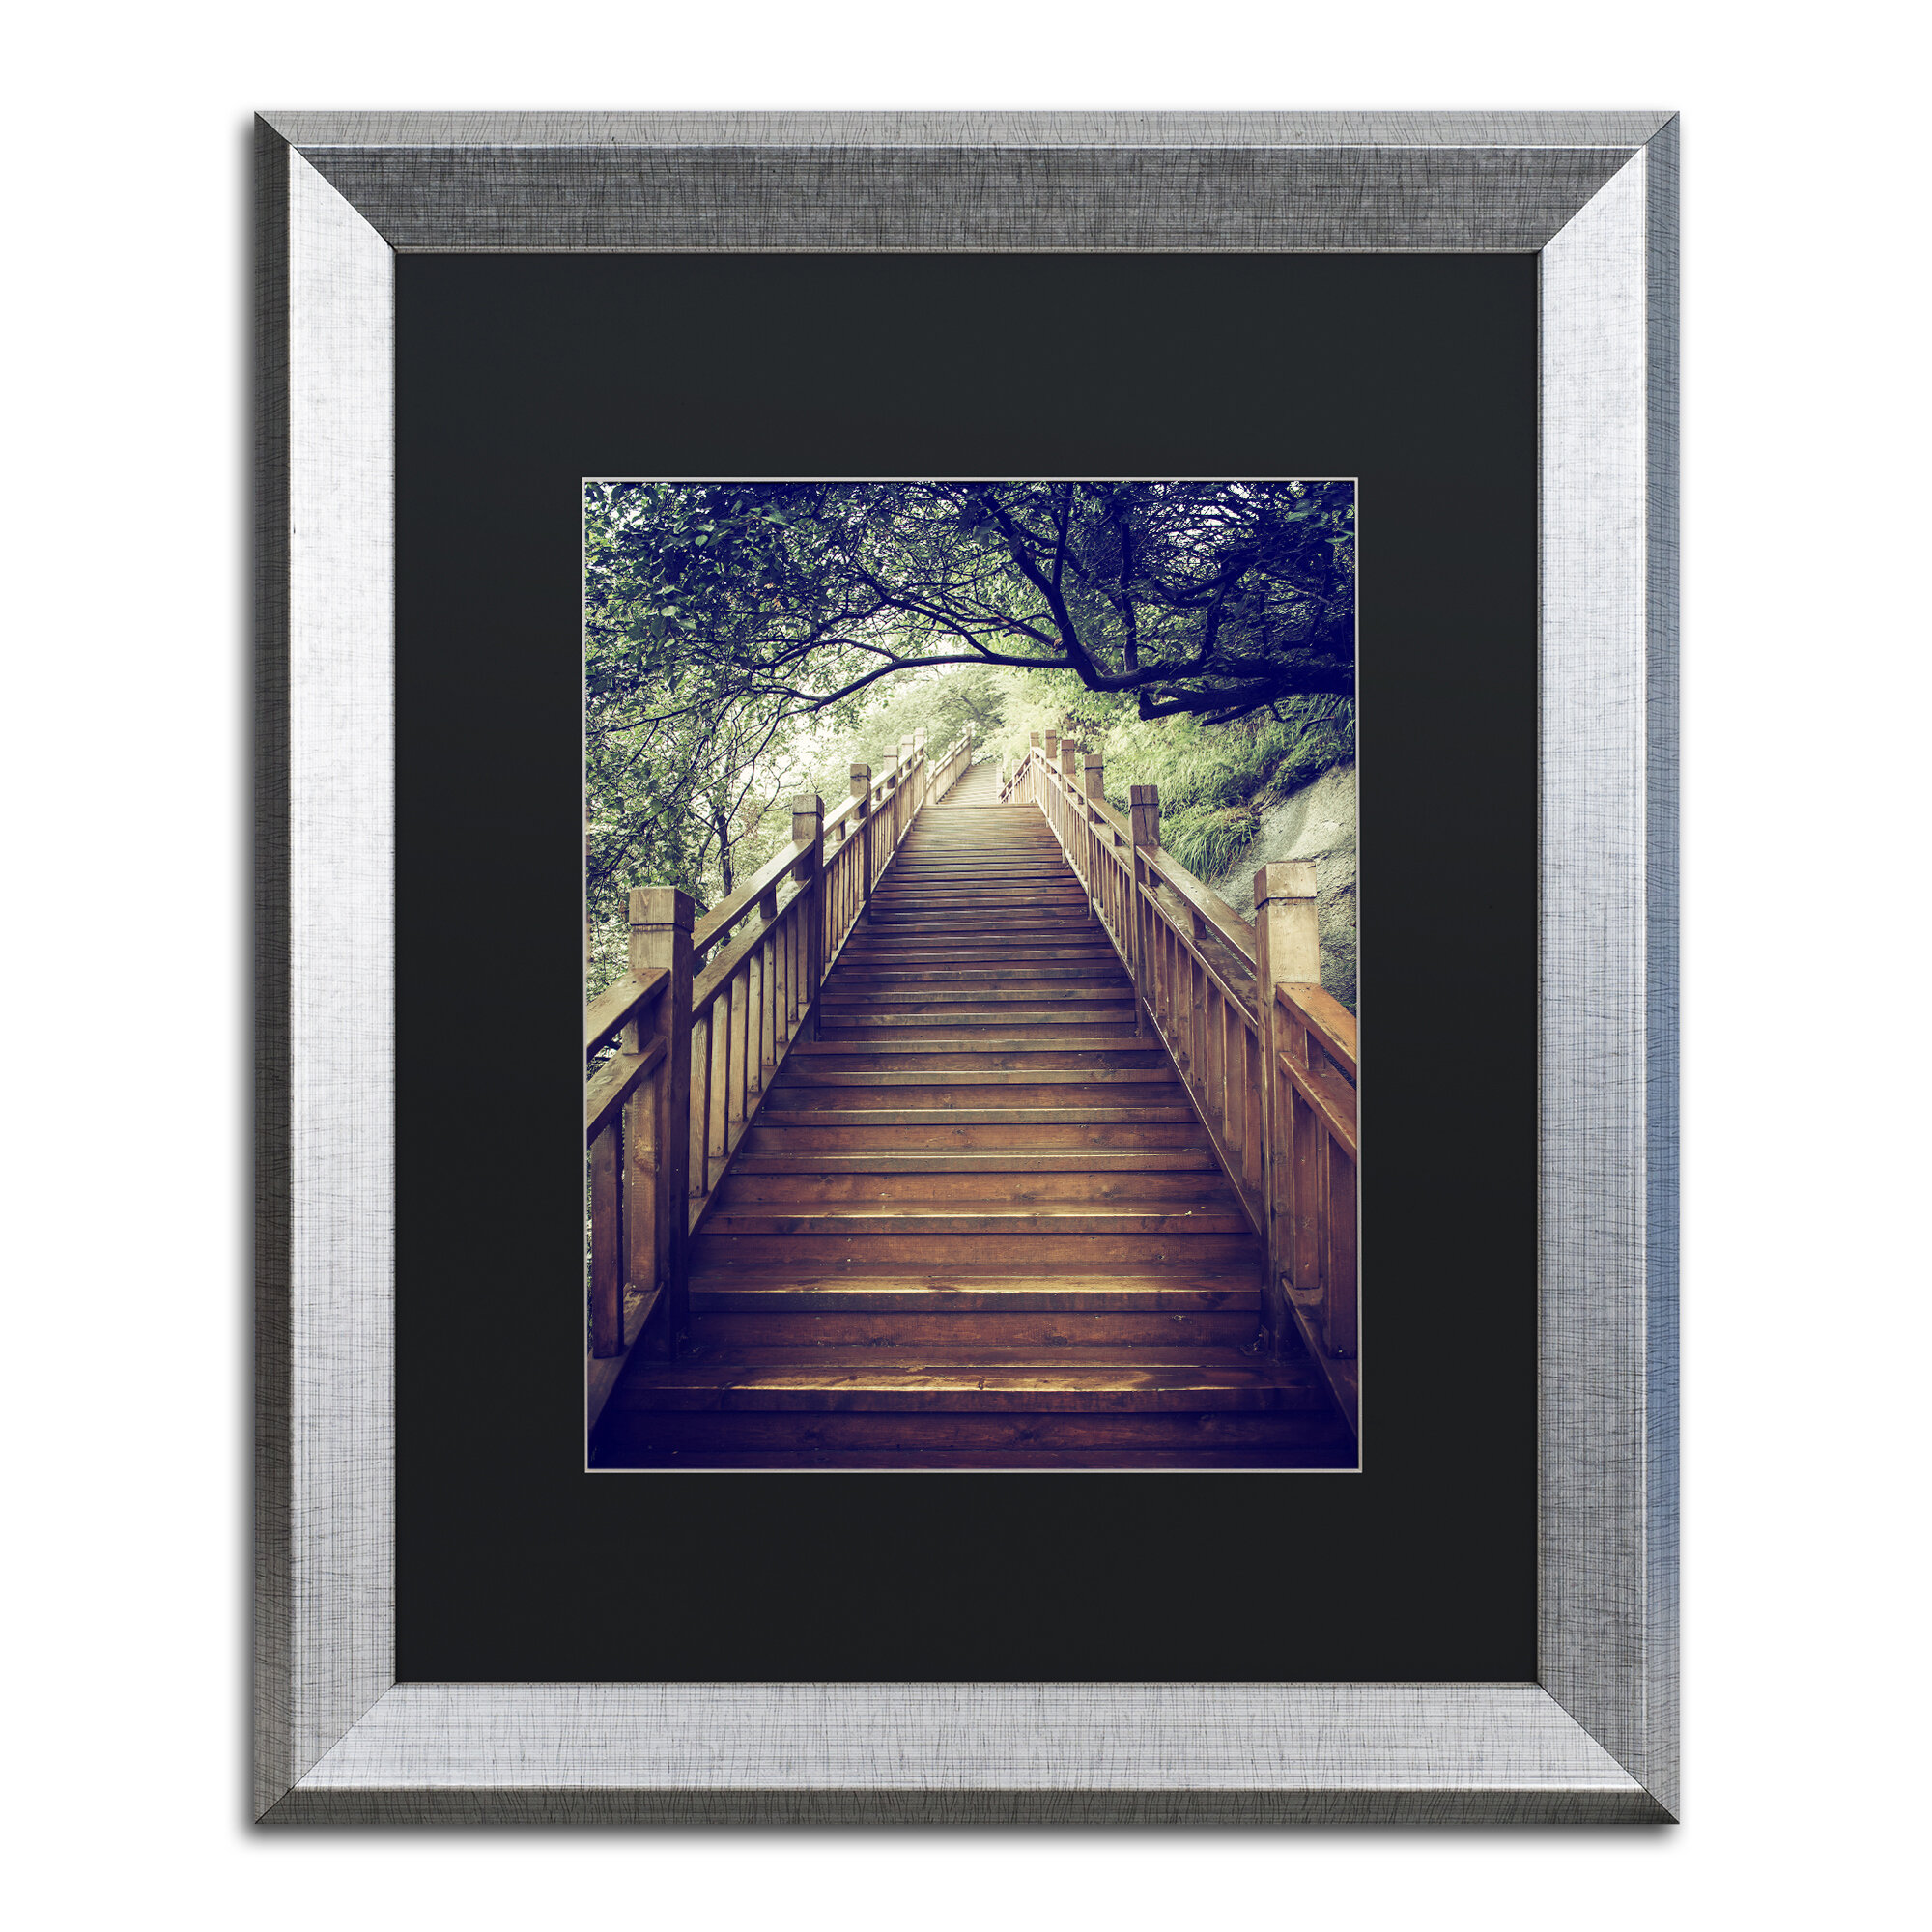 Trademark Art Staircase By Philippe Hugonnard Framed Photographic Print Wayfair